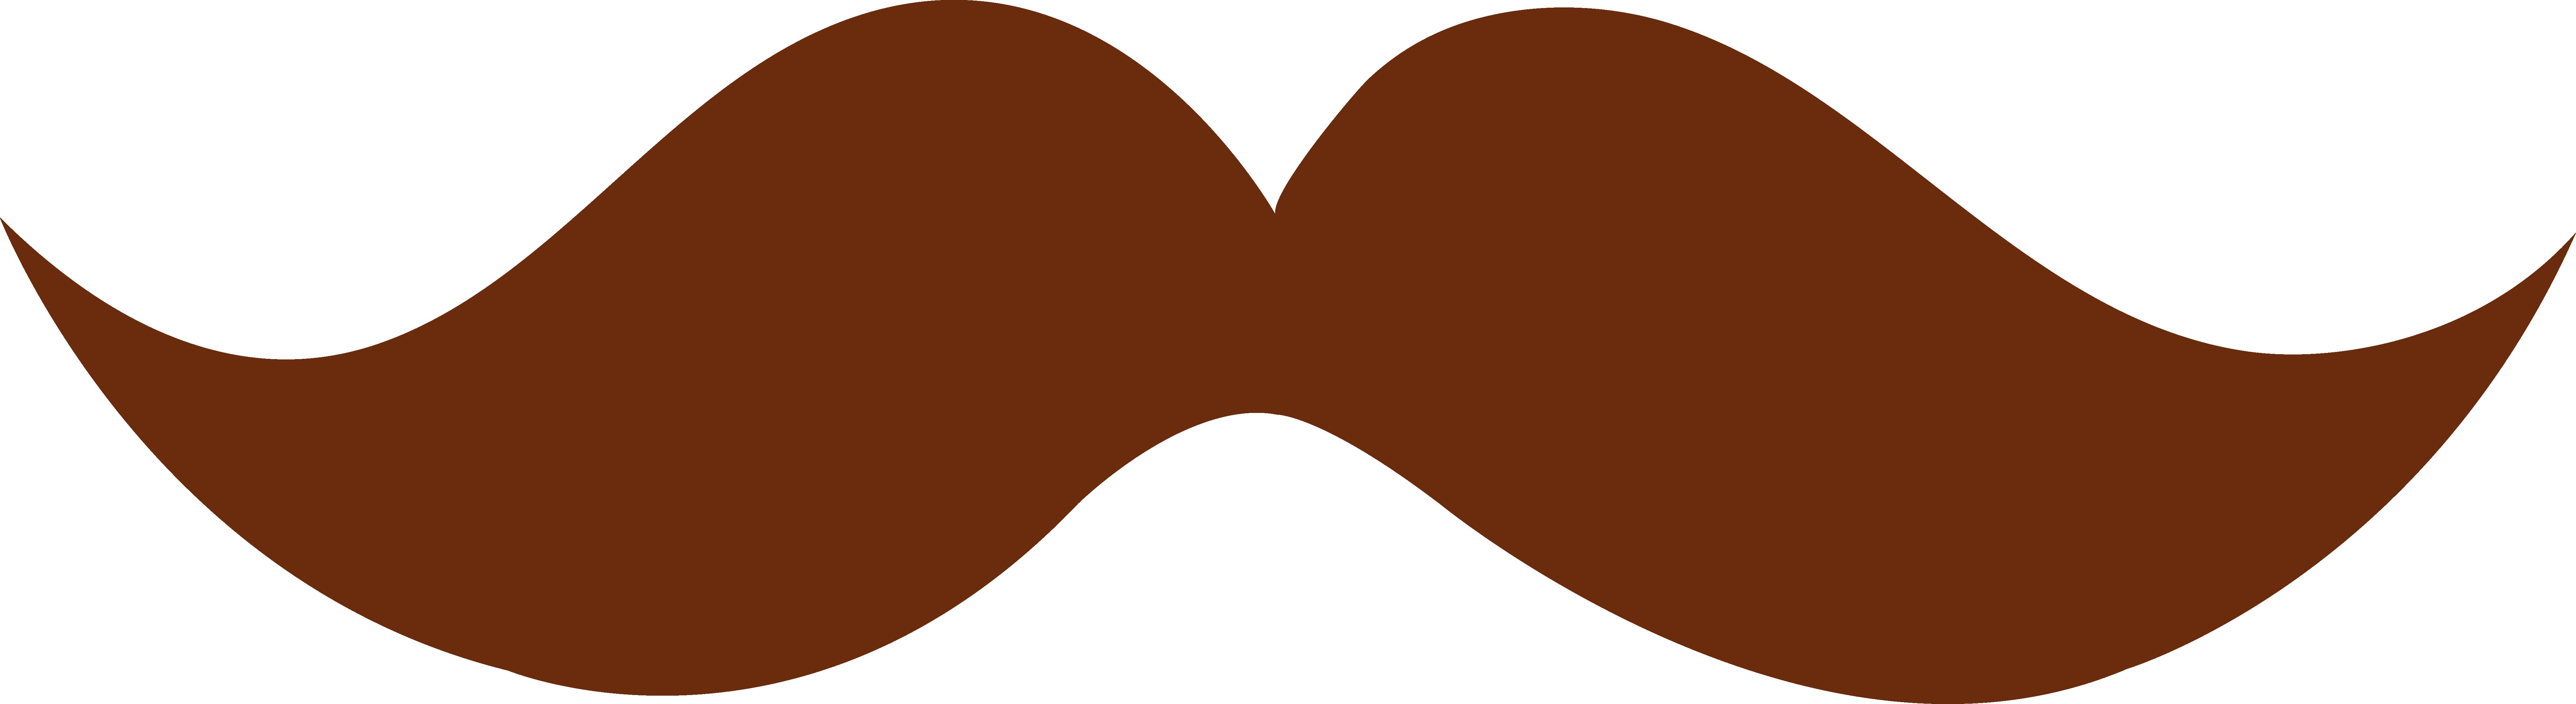 Brown heart clipart download Brown Moustache Design - Free Clip Art download